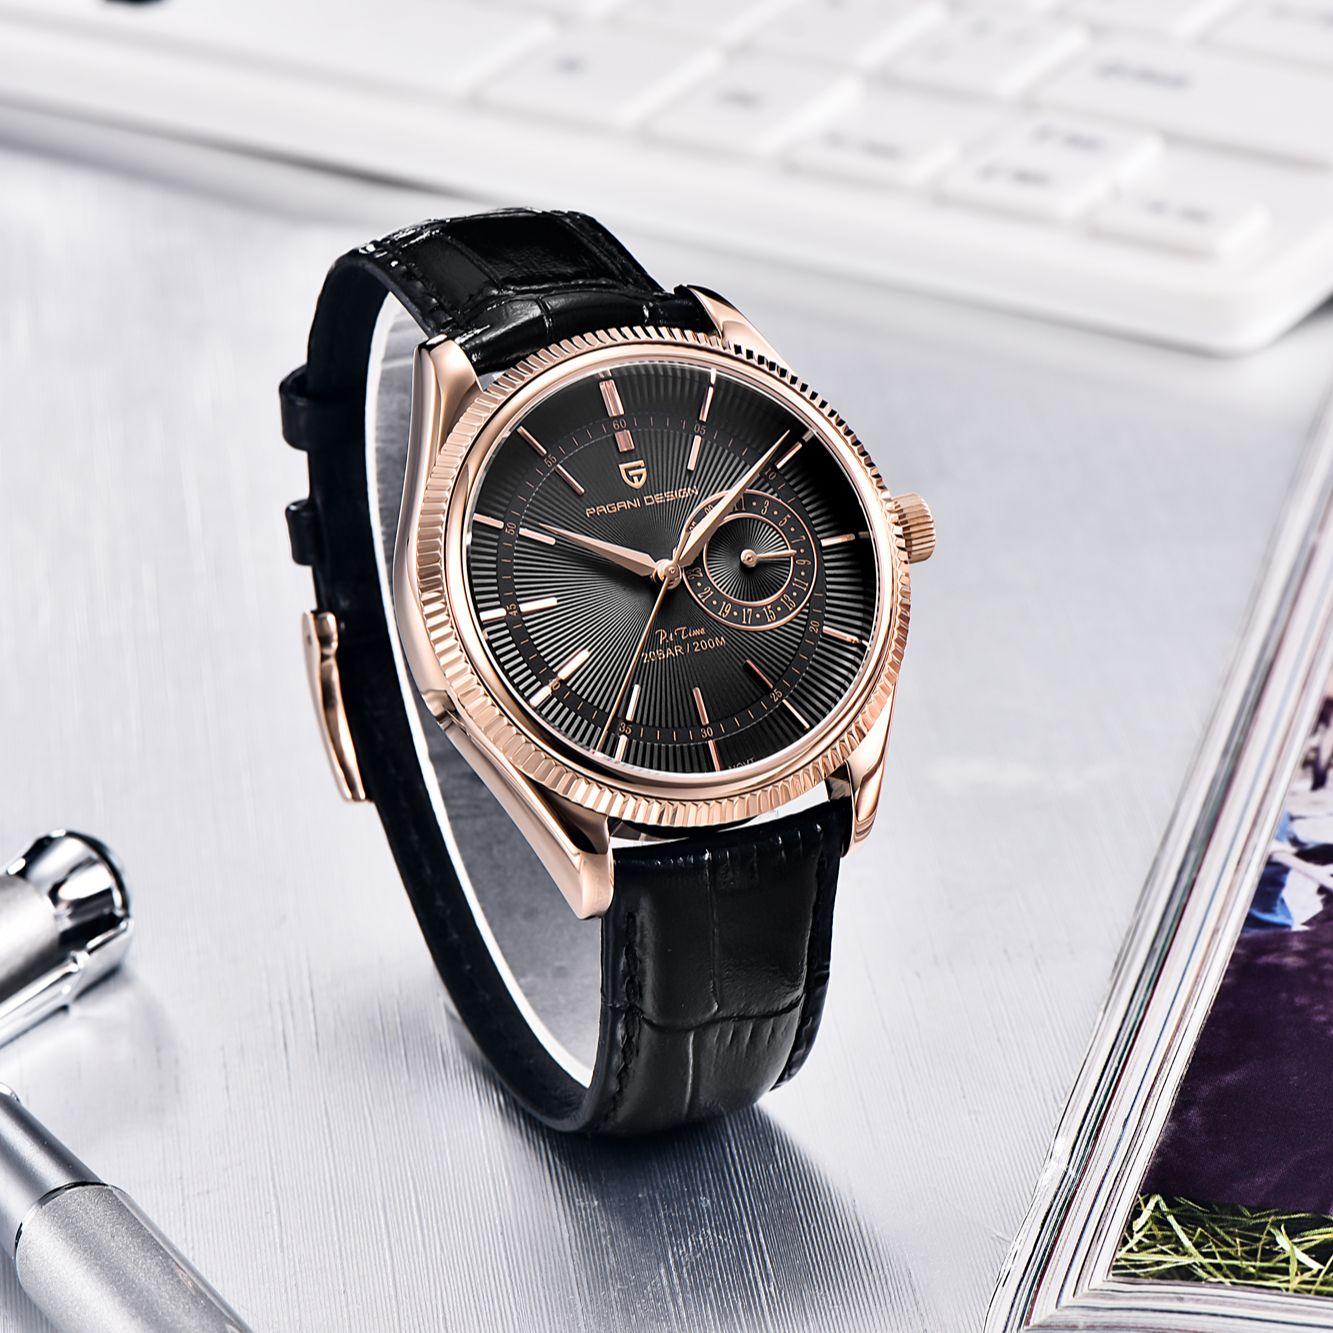 2021 New PAGANI Design Men Watch Stainless Steel Quartz Watch Sapphire Automatic 200m Waterproof Clock Luxury Relogio Masculino enlarge